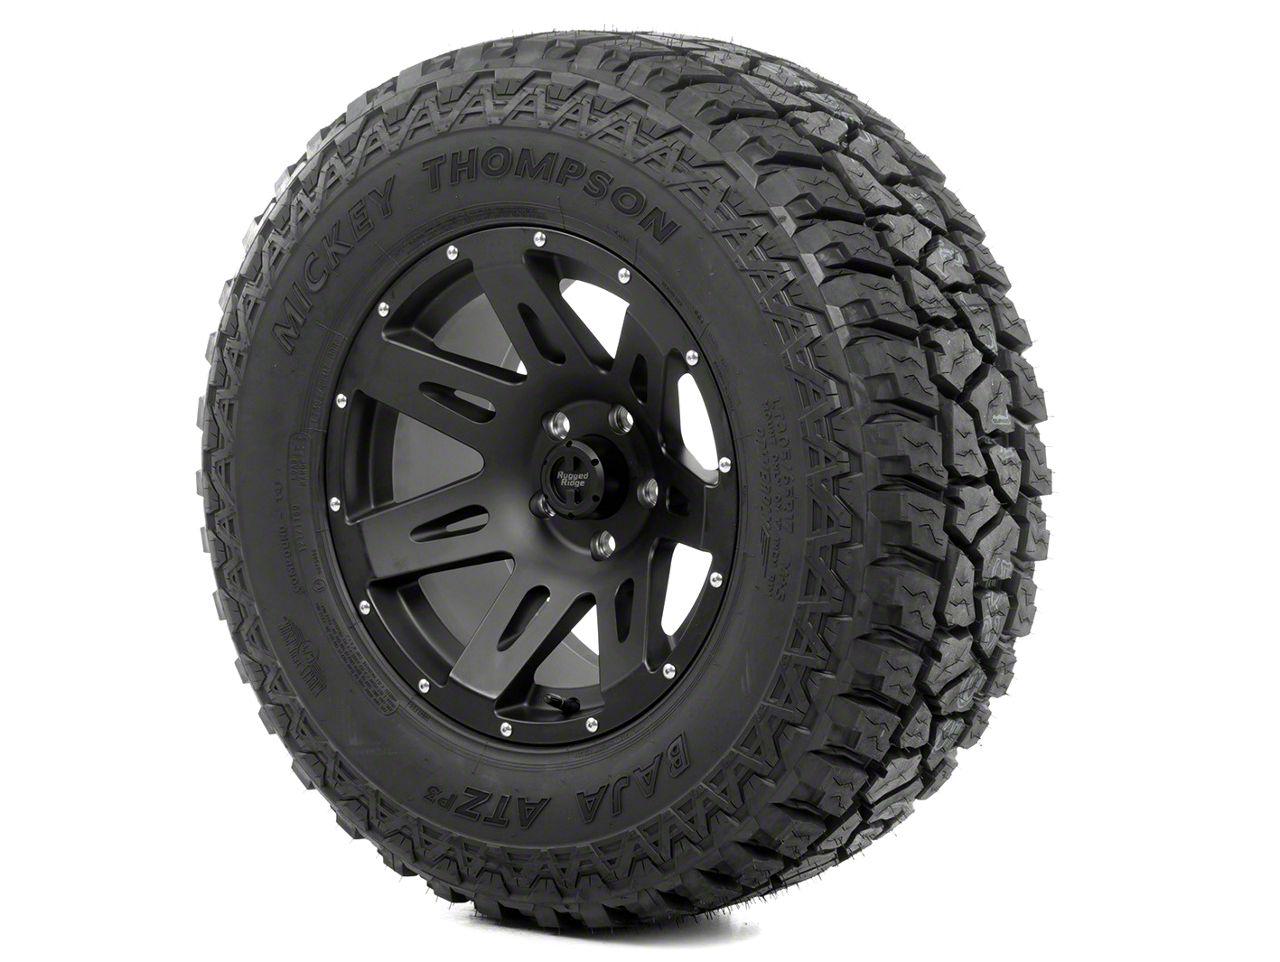 Rugged Ridge XHD Wheel 17x9 Black Satin and Mickey Thompson ATZ P3 305/65R17 Tire Kit (07-12 Jeep Wrangler JK)